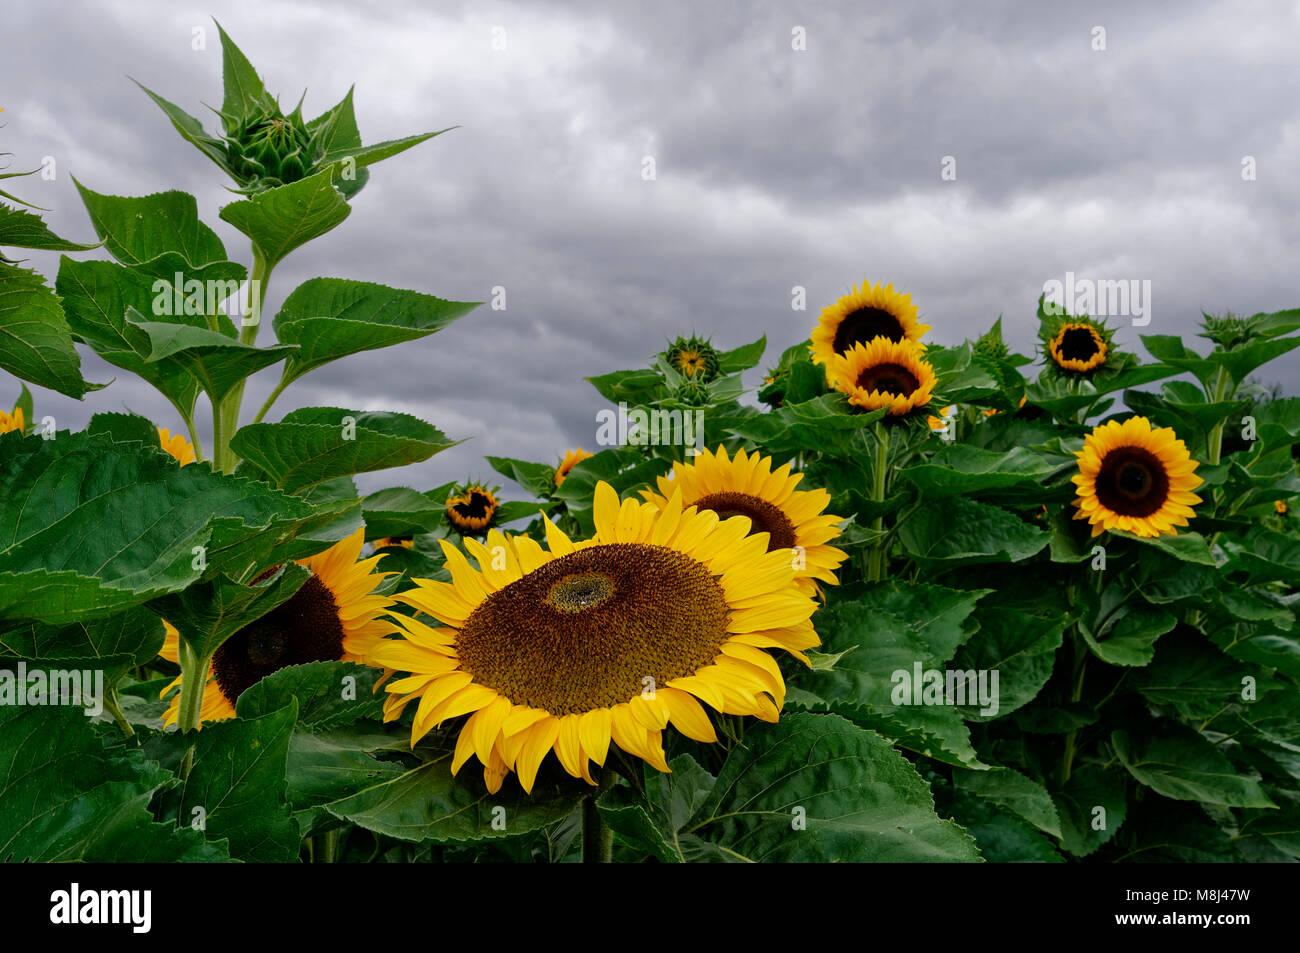 Rain clouds over a sunflower field near Biberach in the Heilbronn district, Baden-Württemberg, Germany Stock Photo